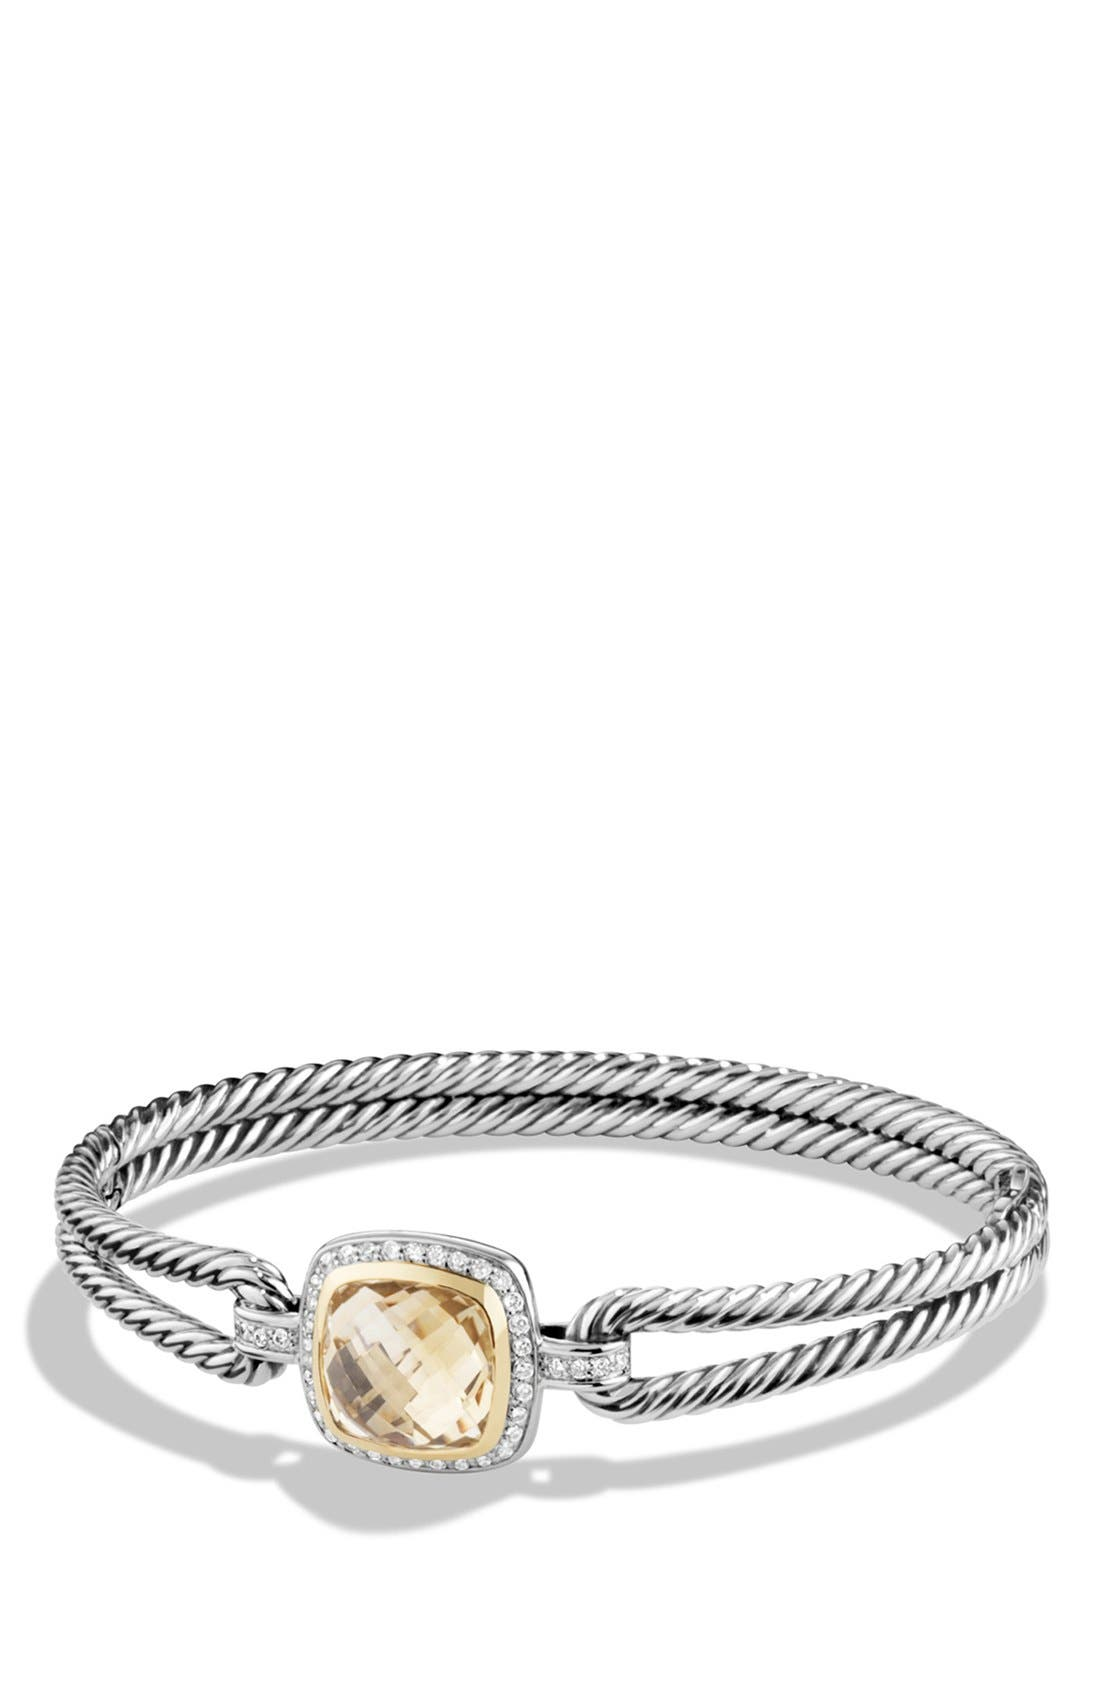 DAVID YURMAN, 'Albion' Bracelet with Diamonds and 18K Gold, Main thumbnail 1, color, CHAMPAGNE CITRINE